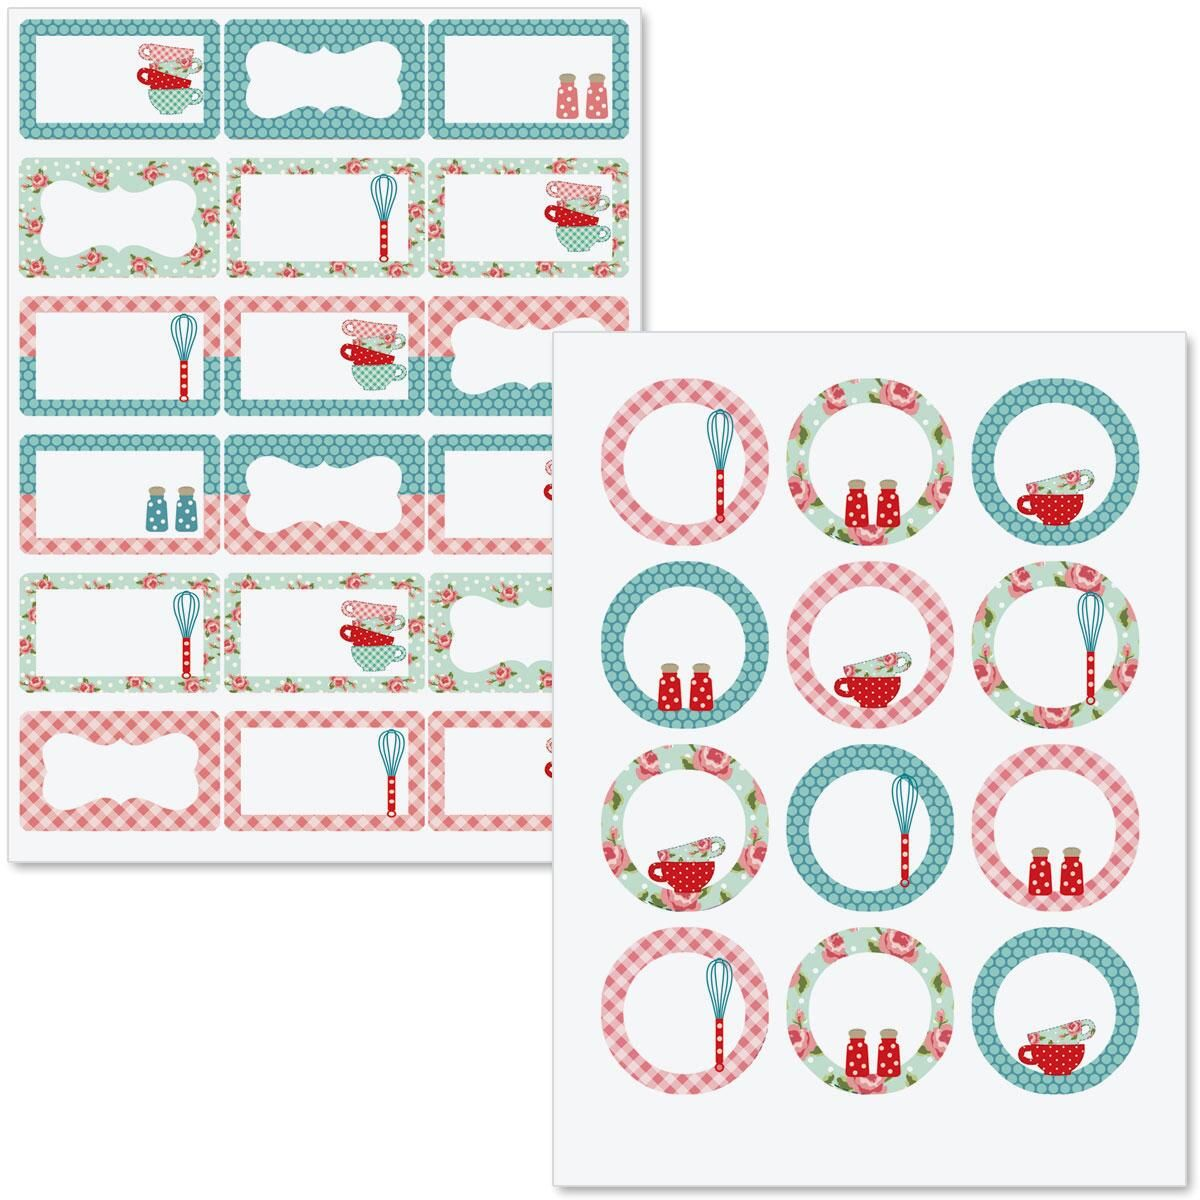 Retro Fabric Canning Jar Labels